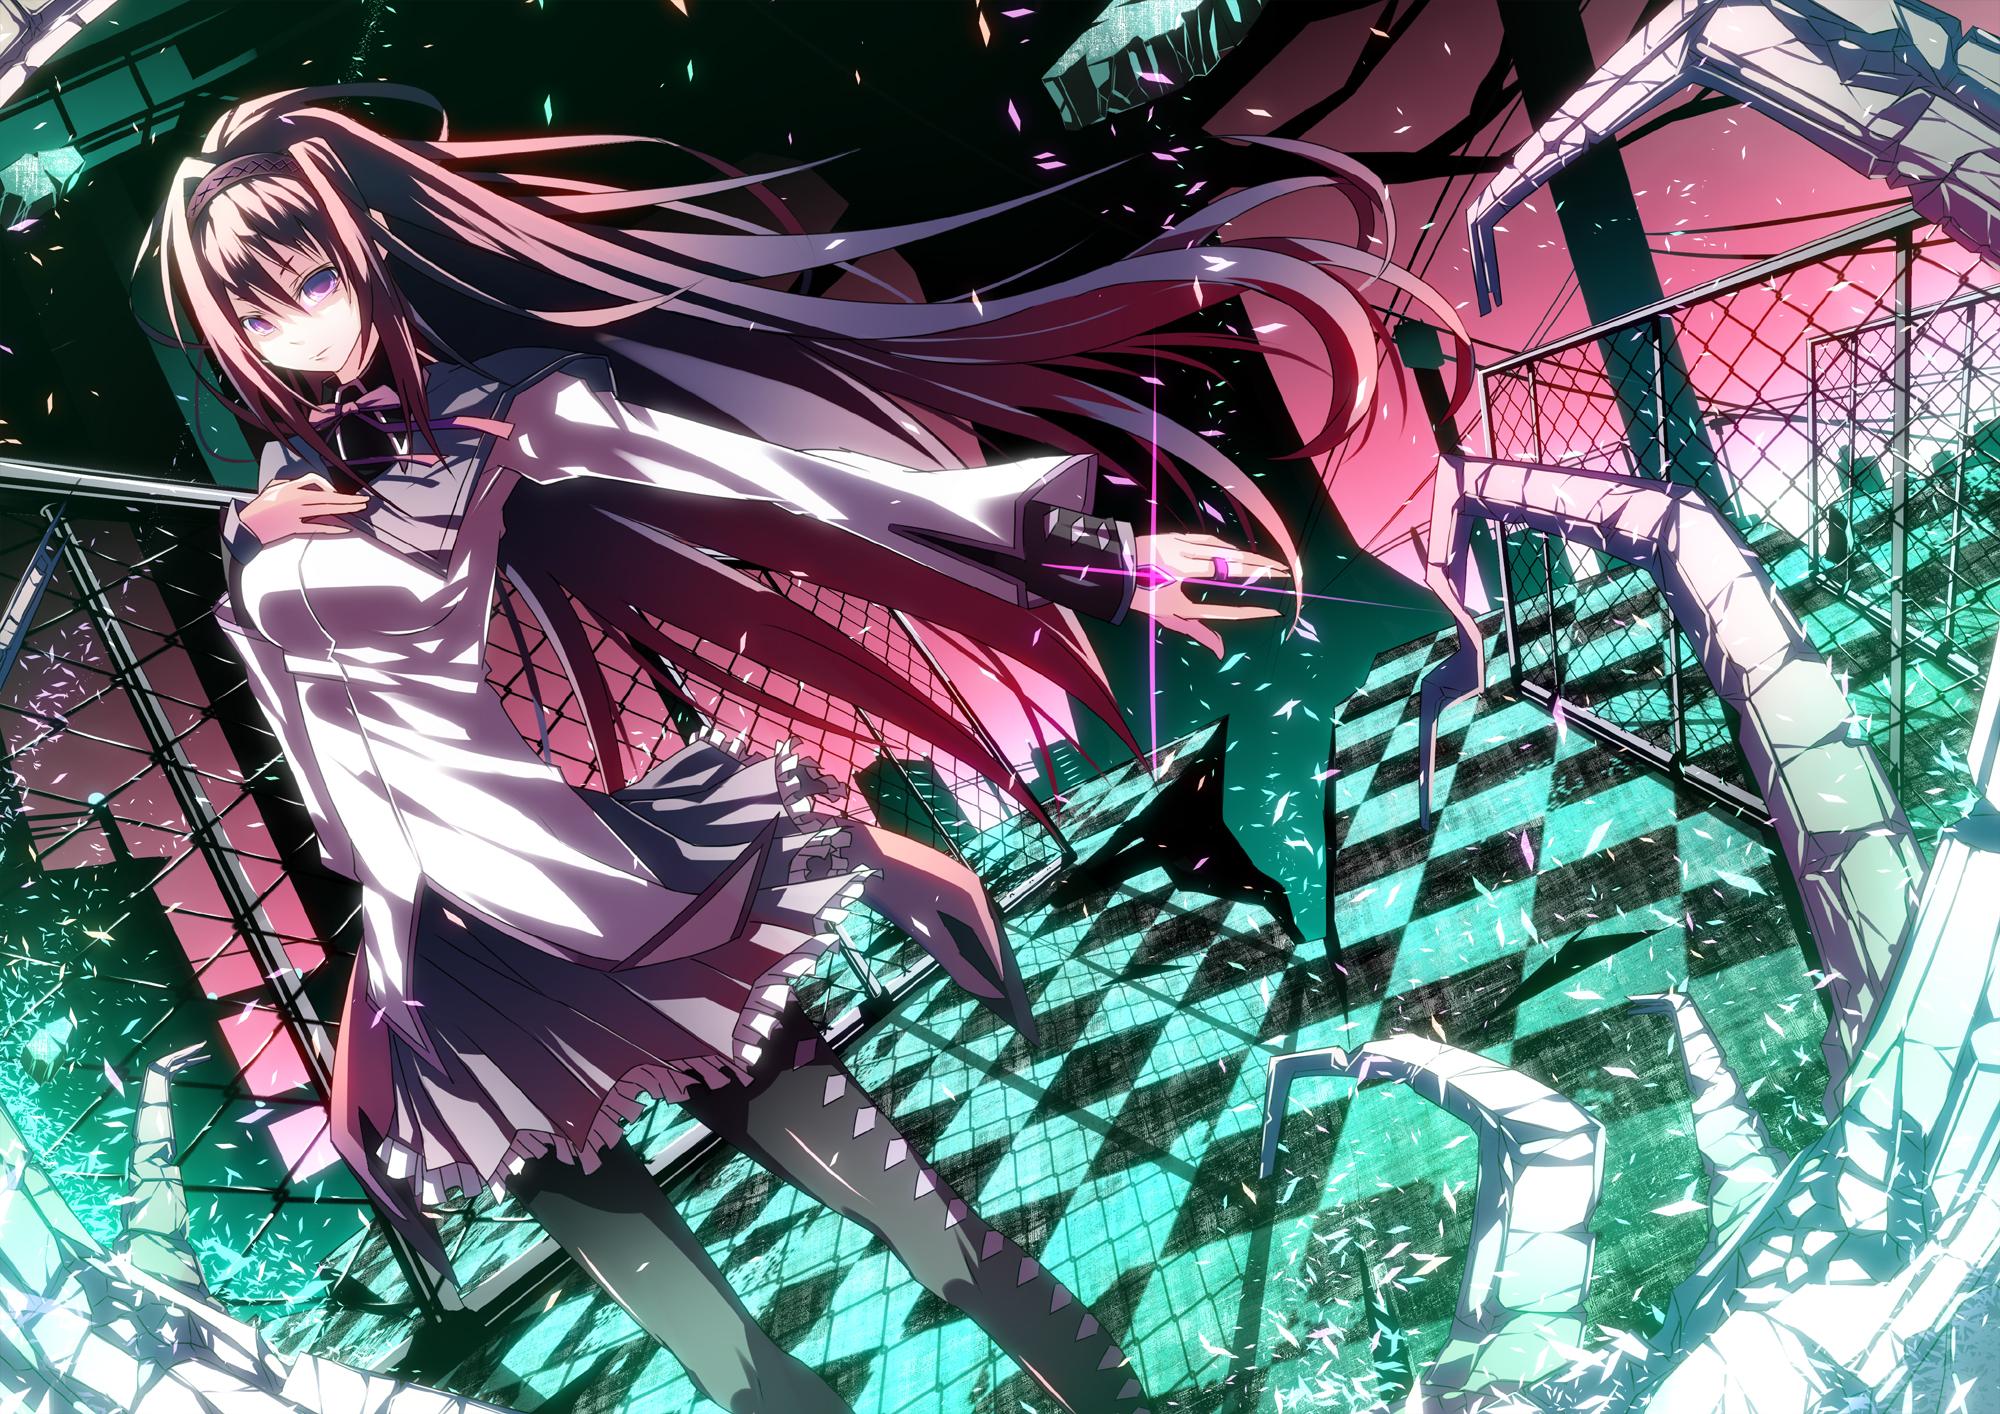 Horror Anime Manga Wallpaper Probably Containing Called Homura Akemi